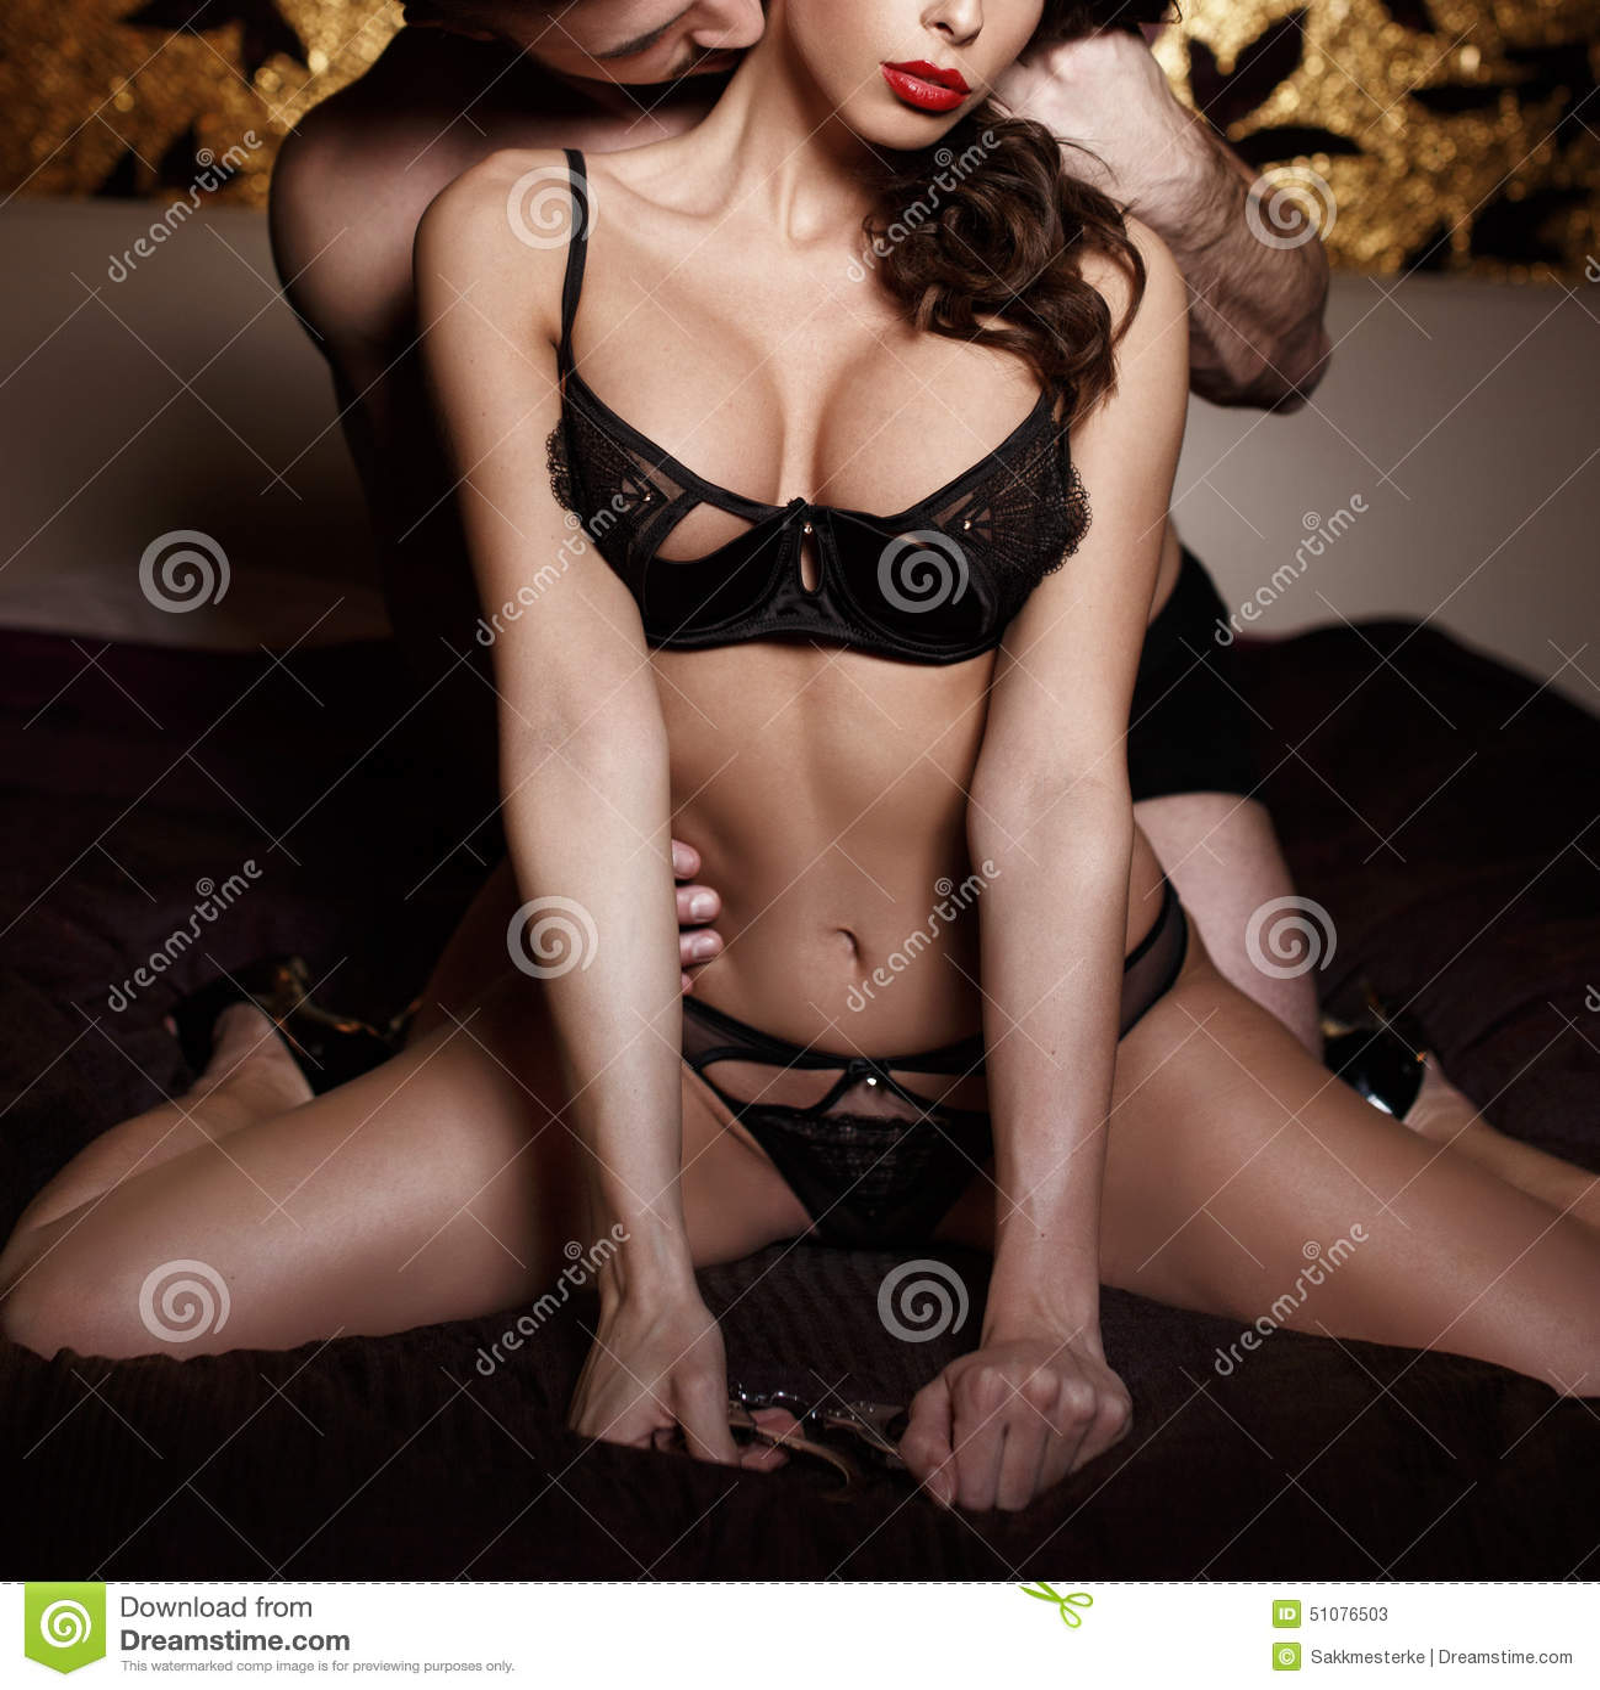 adult body World domination cracks stamina must! I'm sexu